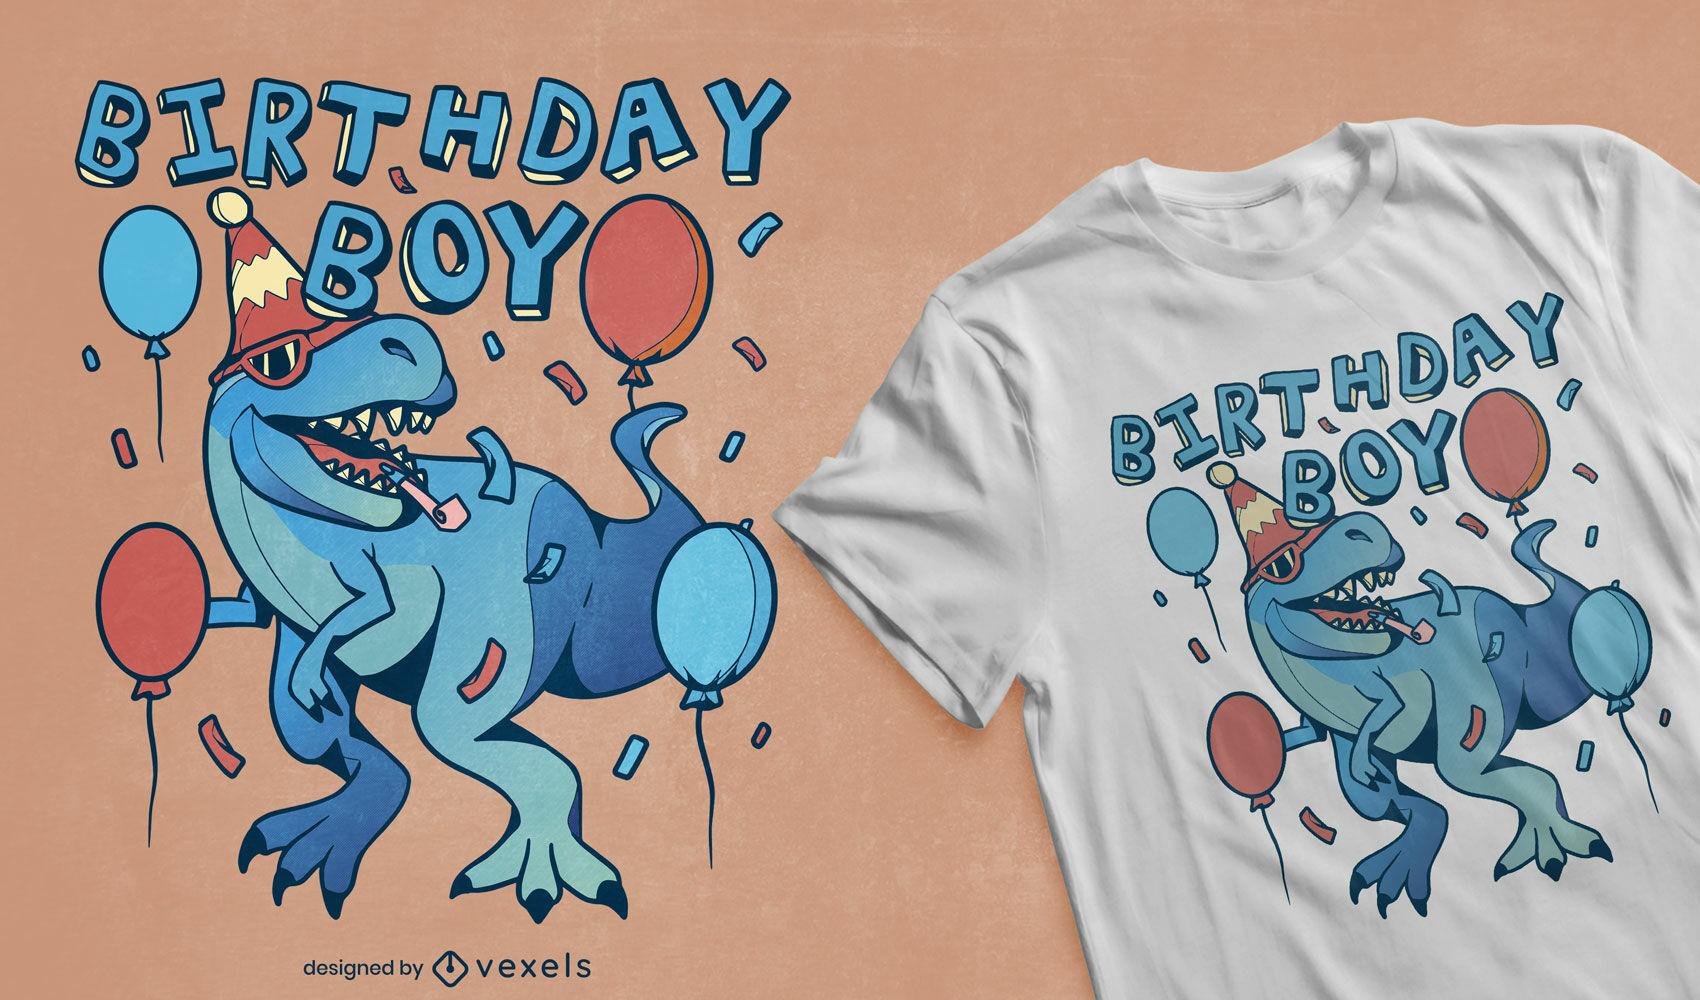 Diseño de camiseta de fiesta de cumpleaños de dinosaurio t-rex.